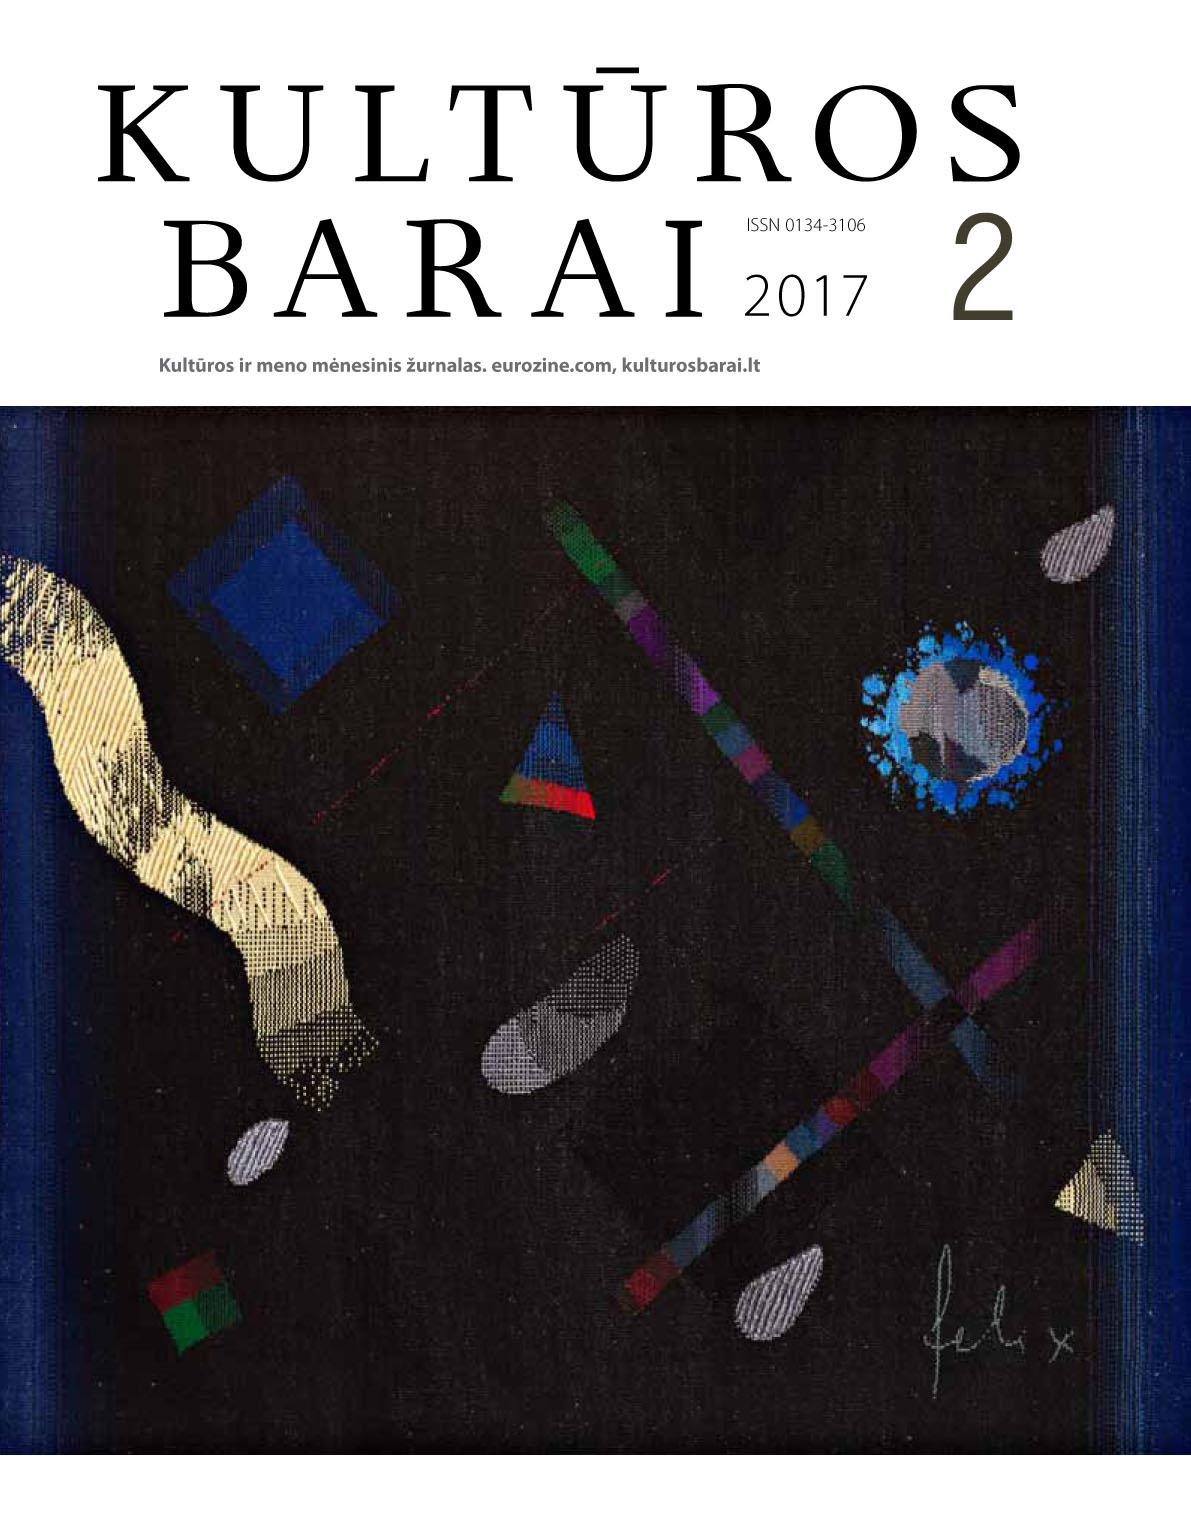 Kulturos Barai cover 2 2017